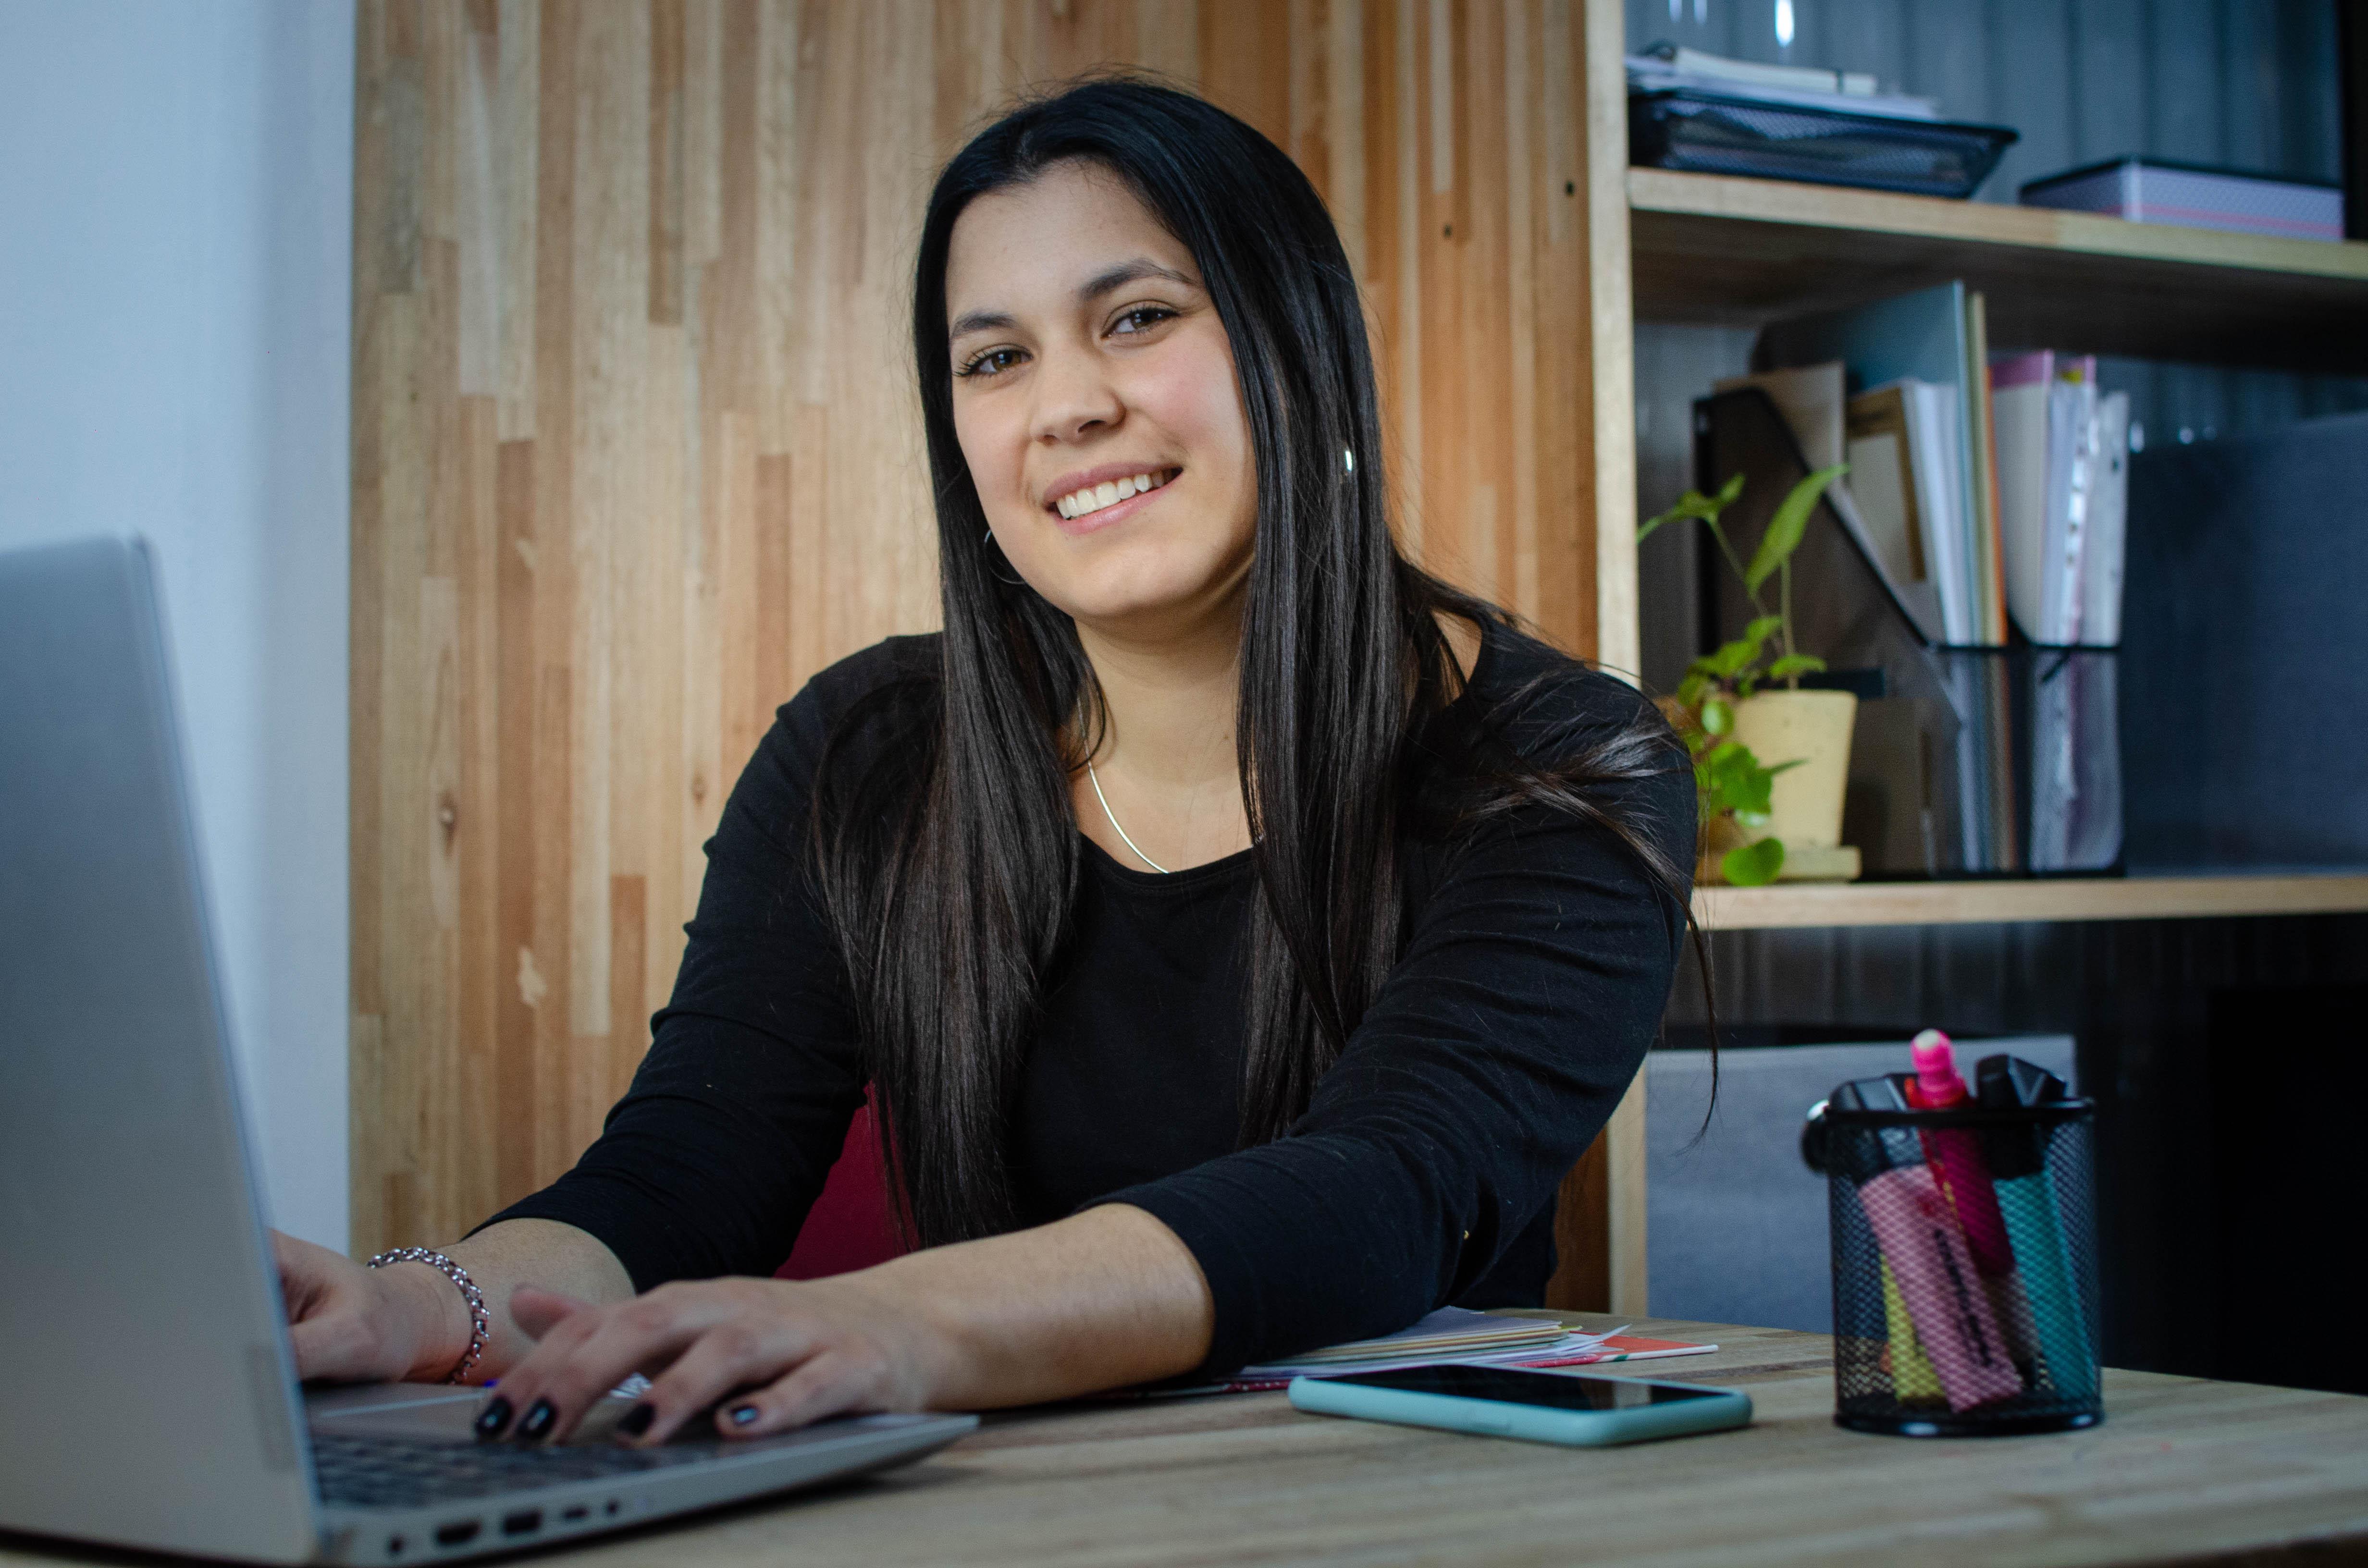 Micaela Aguirre Zabala